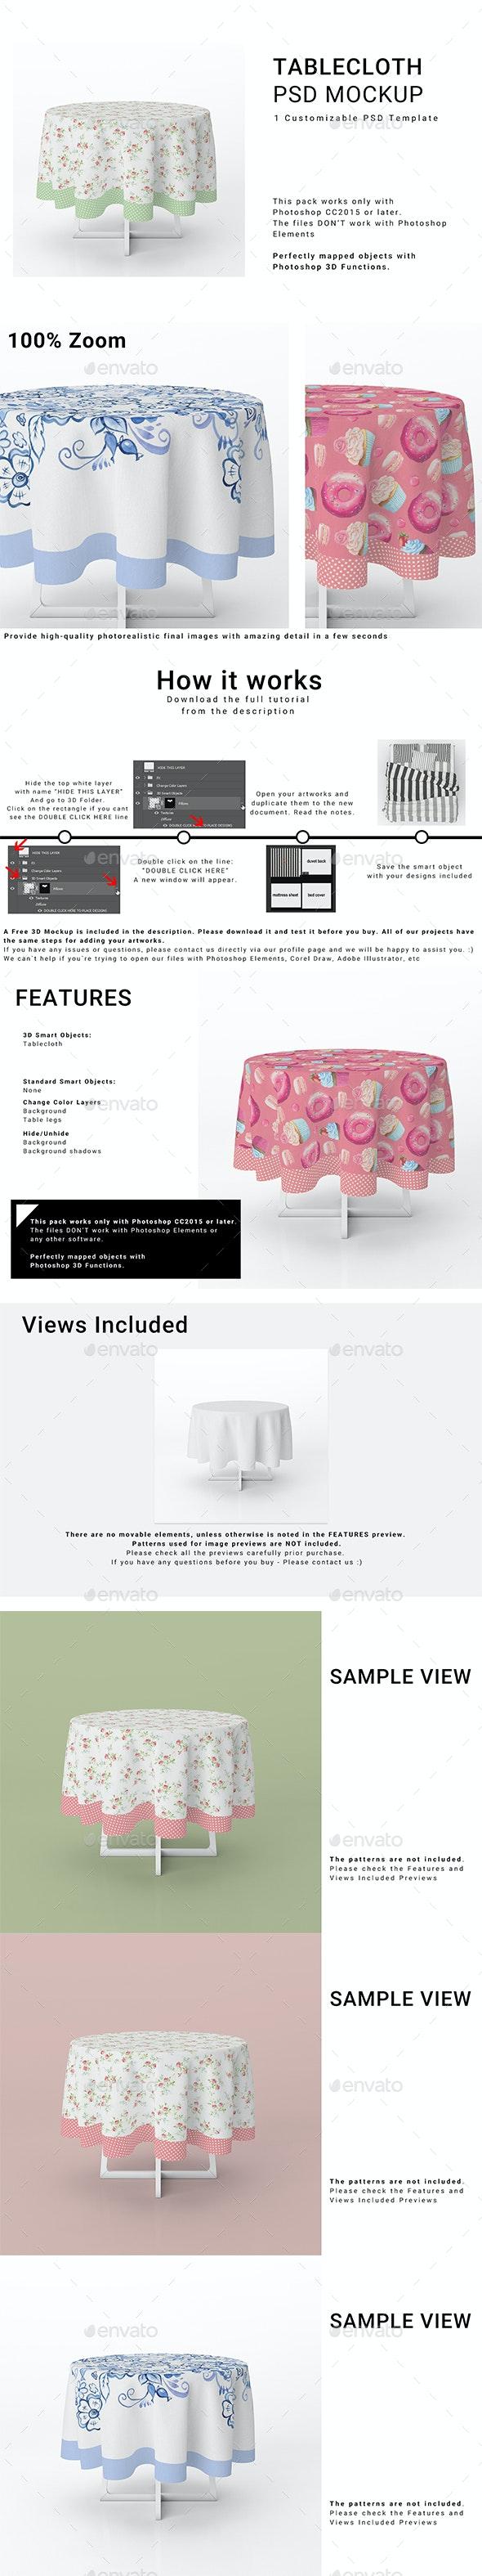 Round Tablecloth Mockup Set - Print Product Mock-Ups